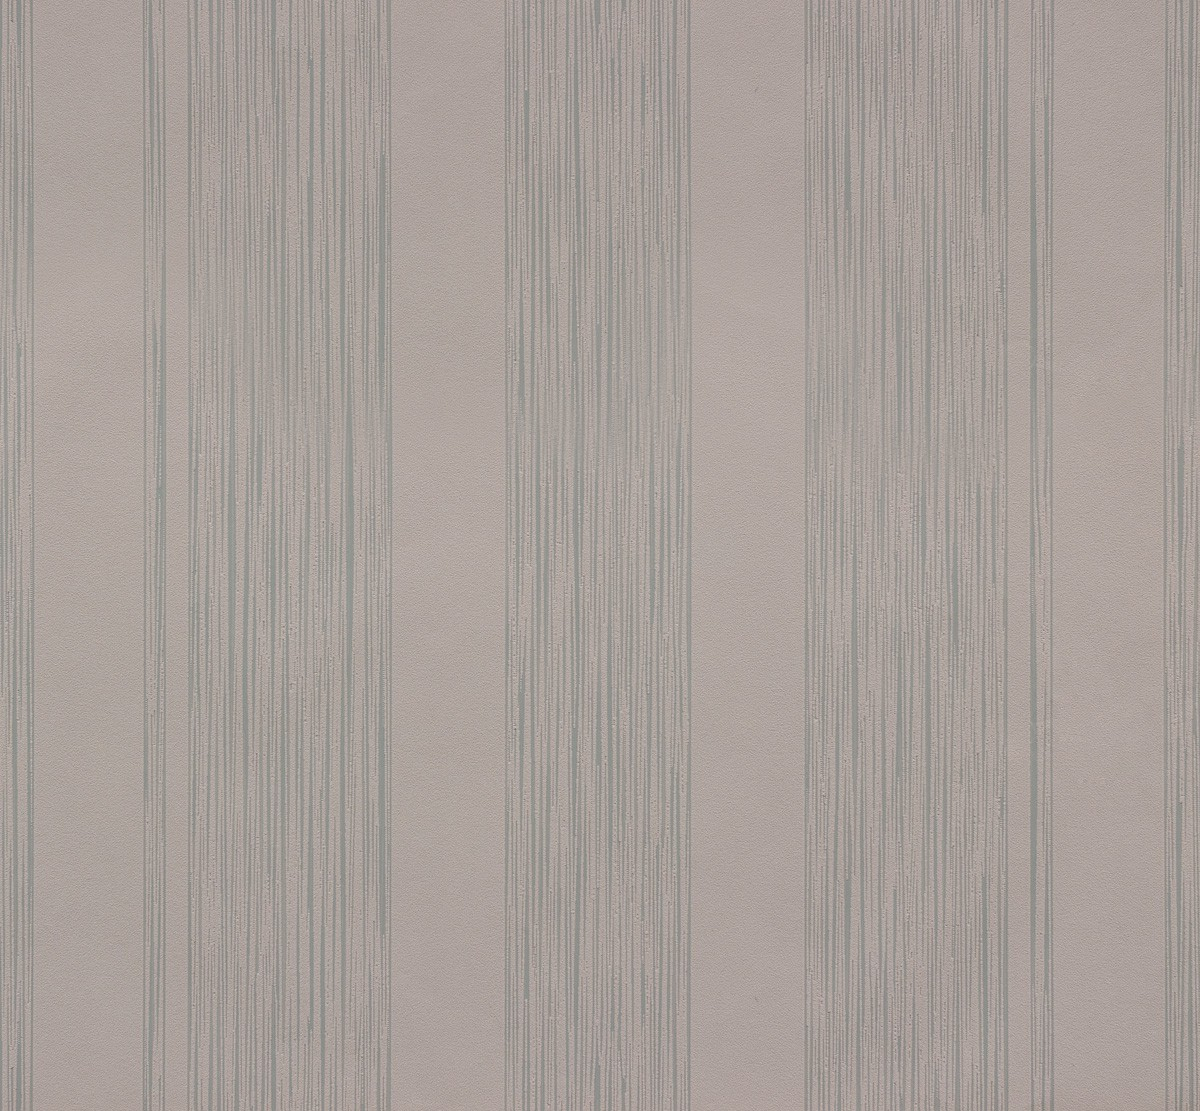 Vliestapete taupe grau streifen marburg 56721 - Taupe grau wandfarbe ...